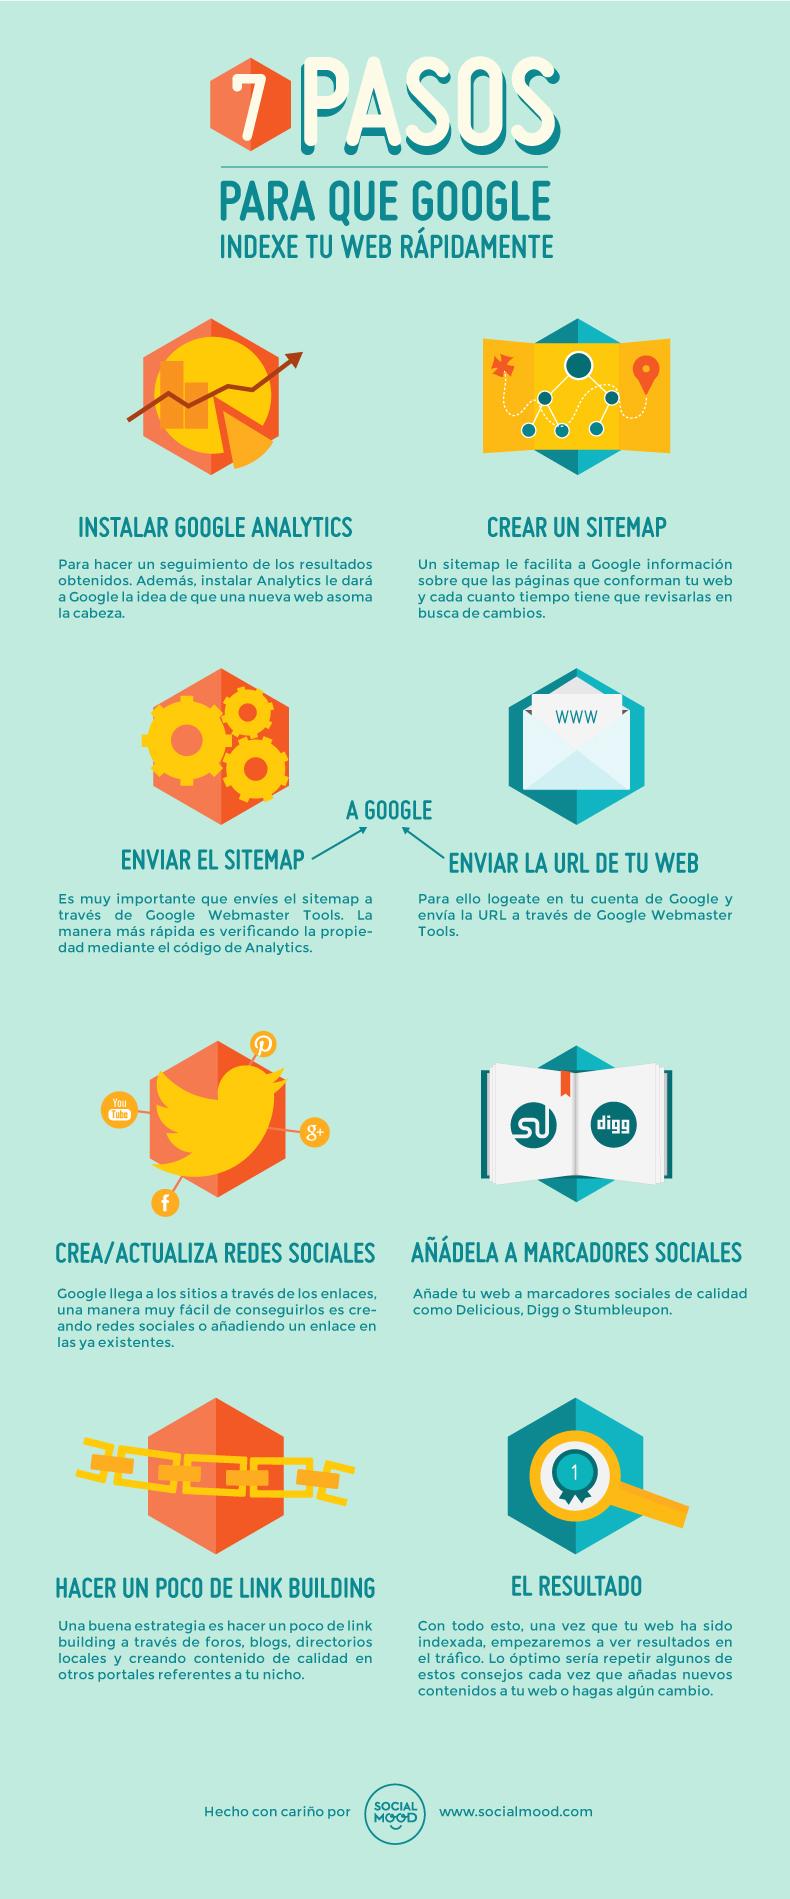 7 pasos básicos para que Google indexe tu web más rápido. #Infografía